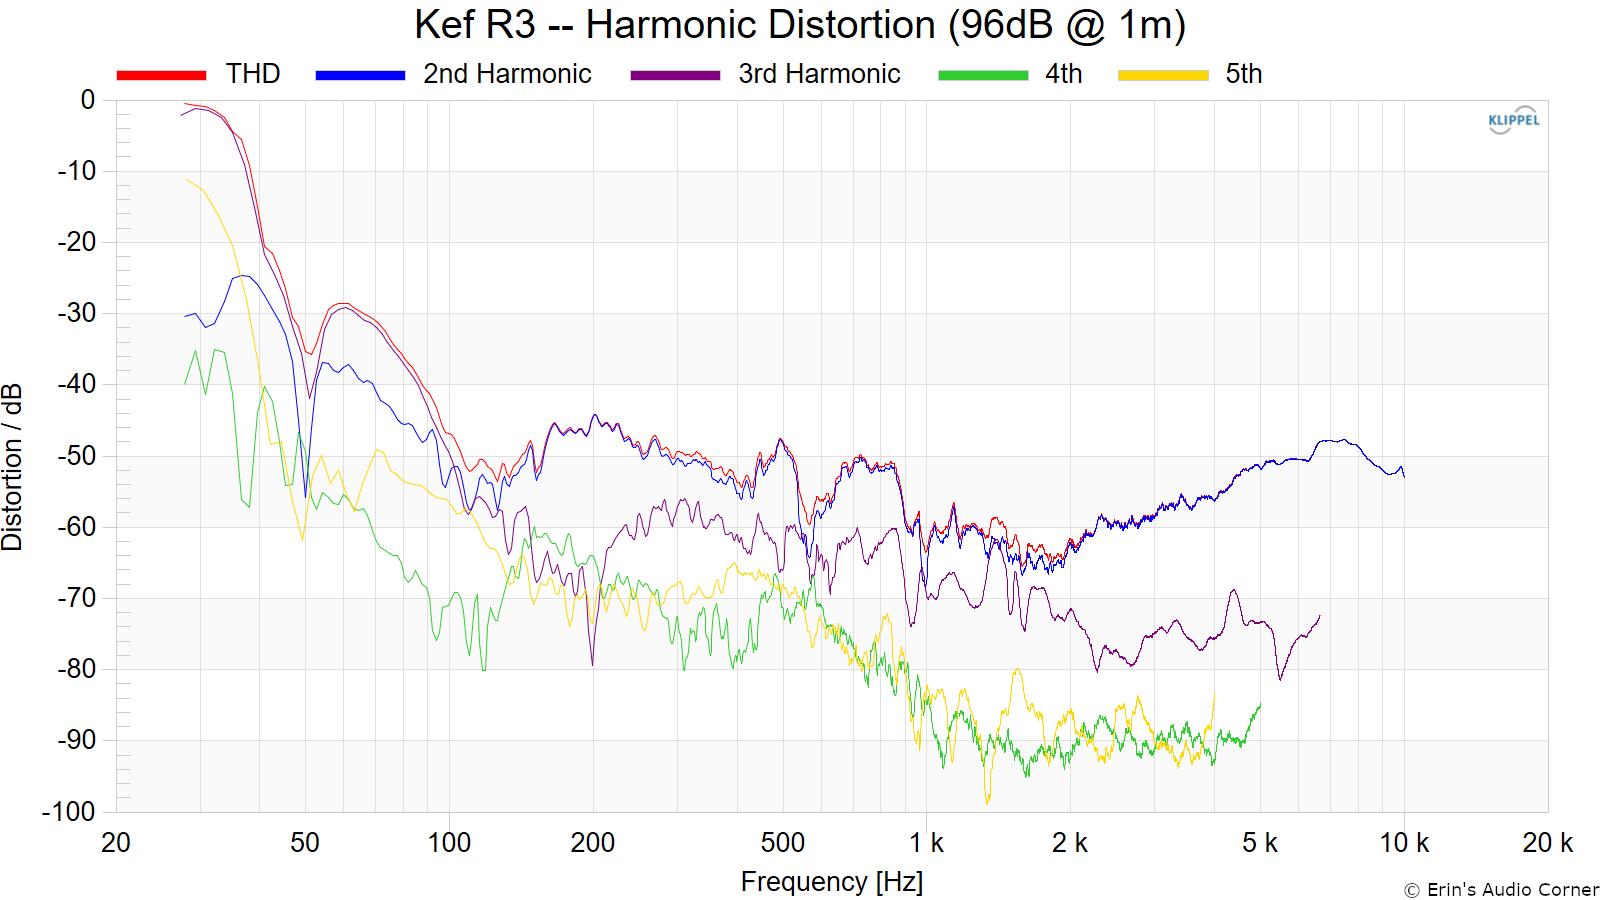 Kef%20R3%20--%20Harmonic%20Distortion%20%2896dB%20%40%201m%29.png